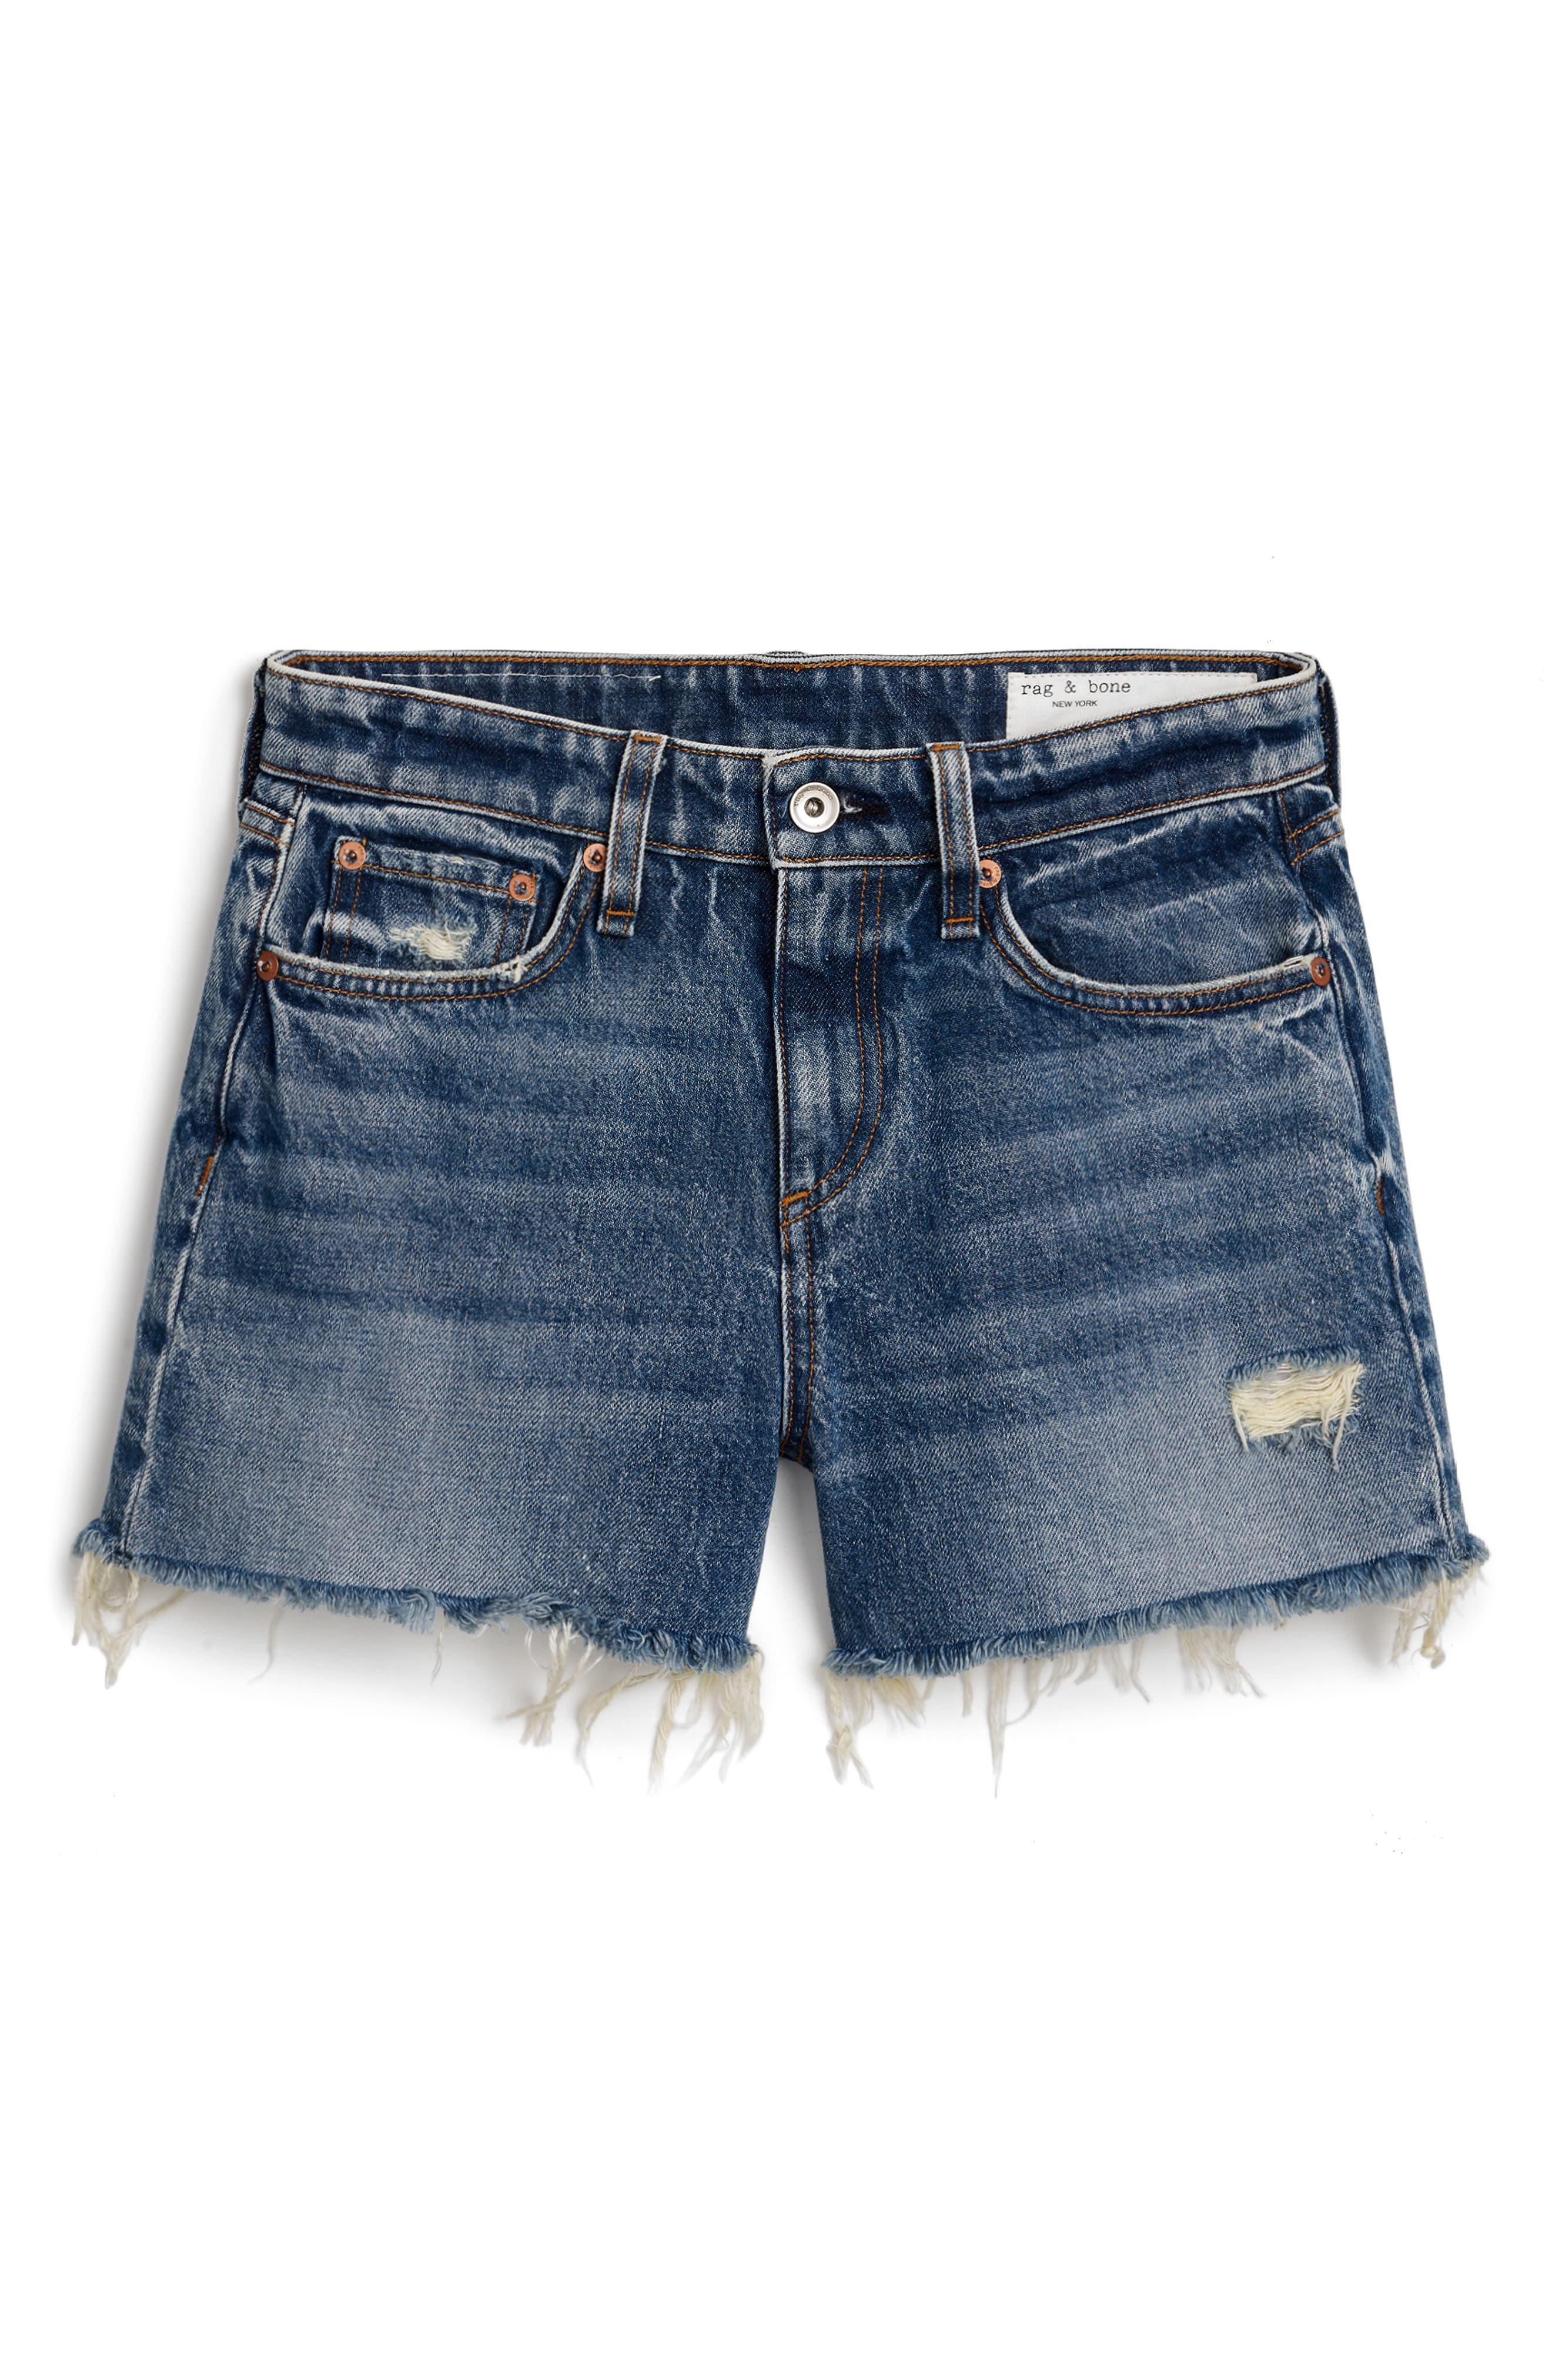 "Men`s Cut Off Denim Shorts Waist Size 28/"" Waist Dark Blue Button Fly"